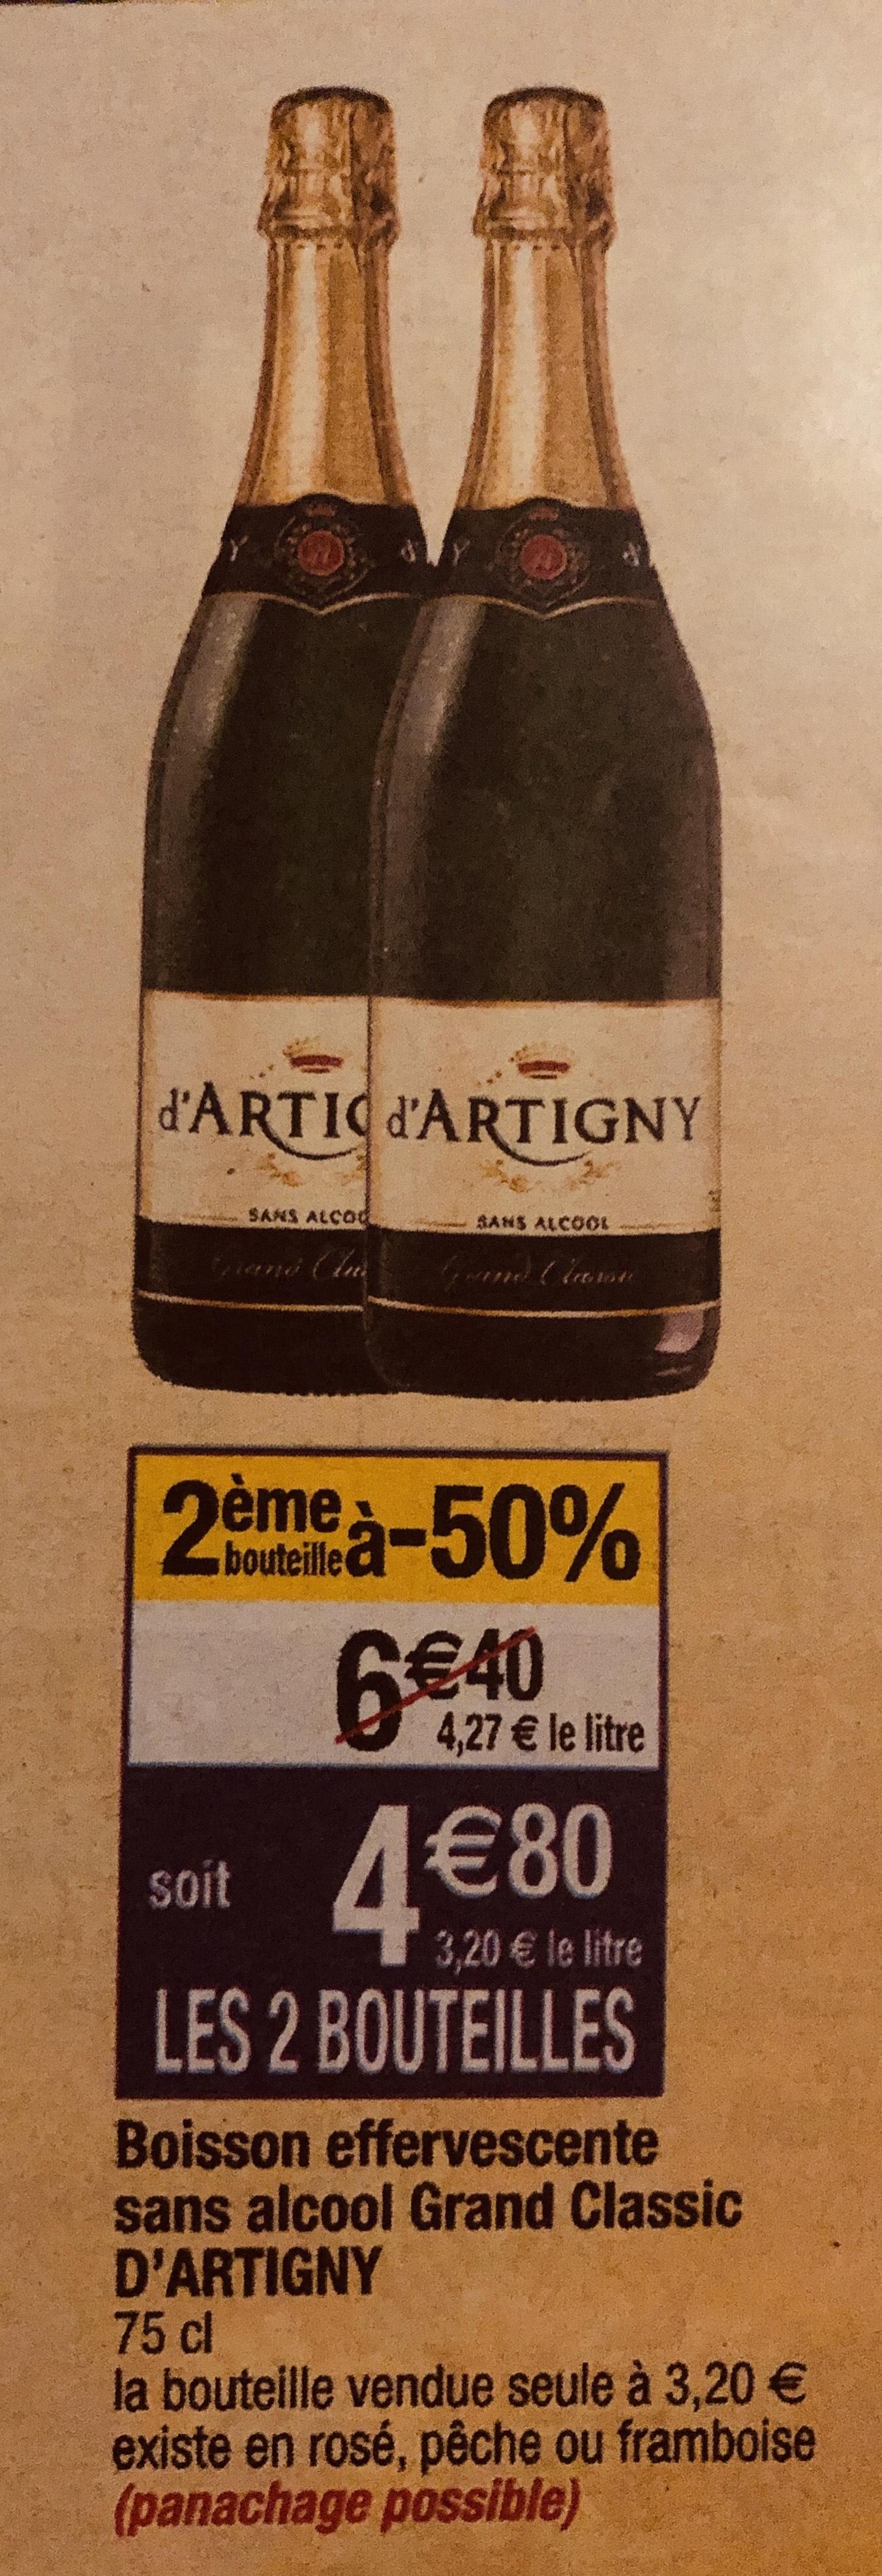 4 Bouteilles d'effervescents sans alcool d'Artigny (Via Shopmium)